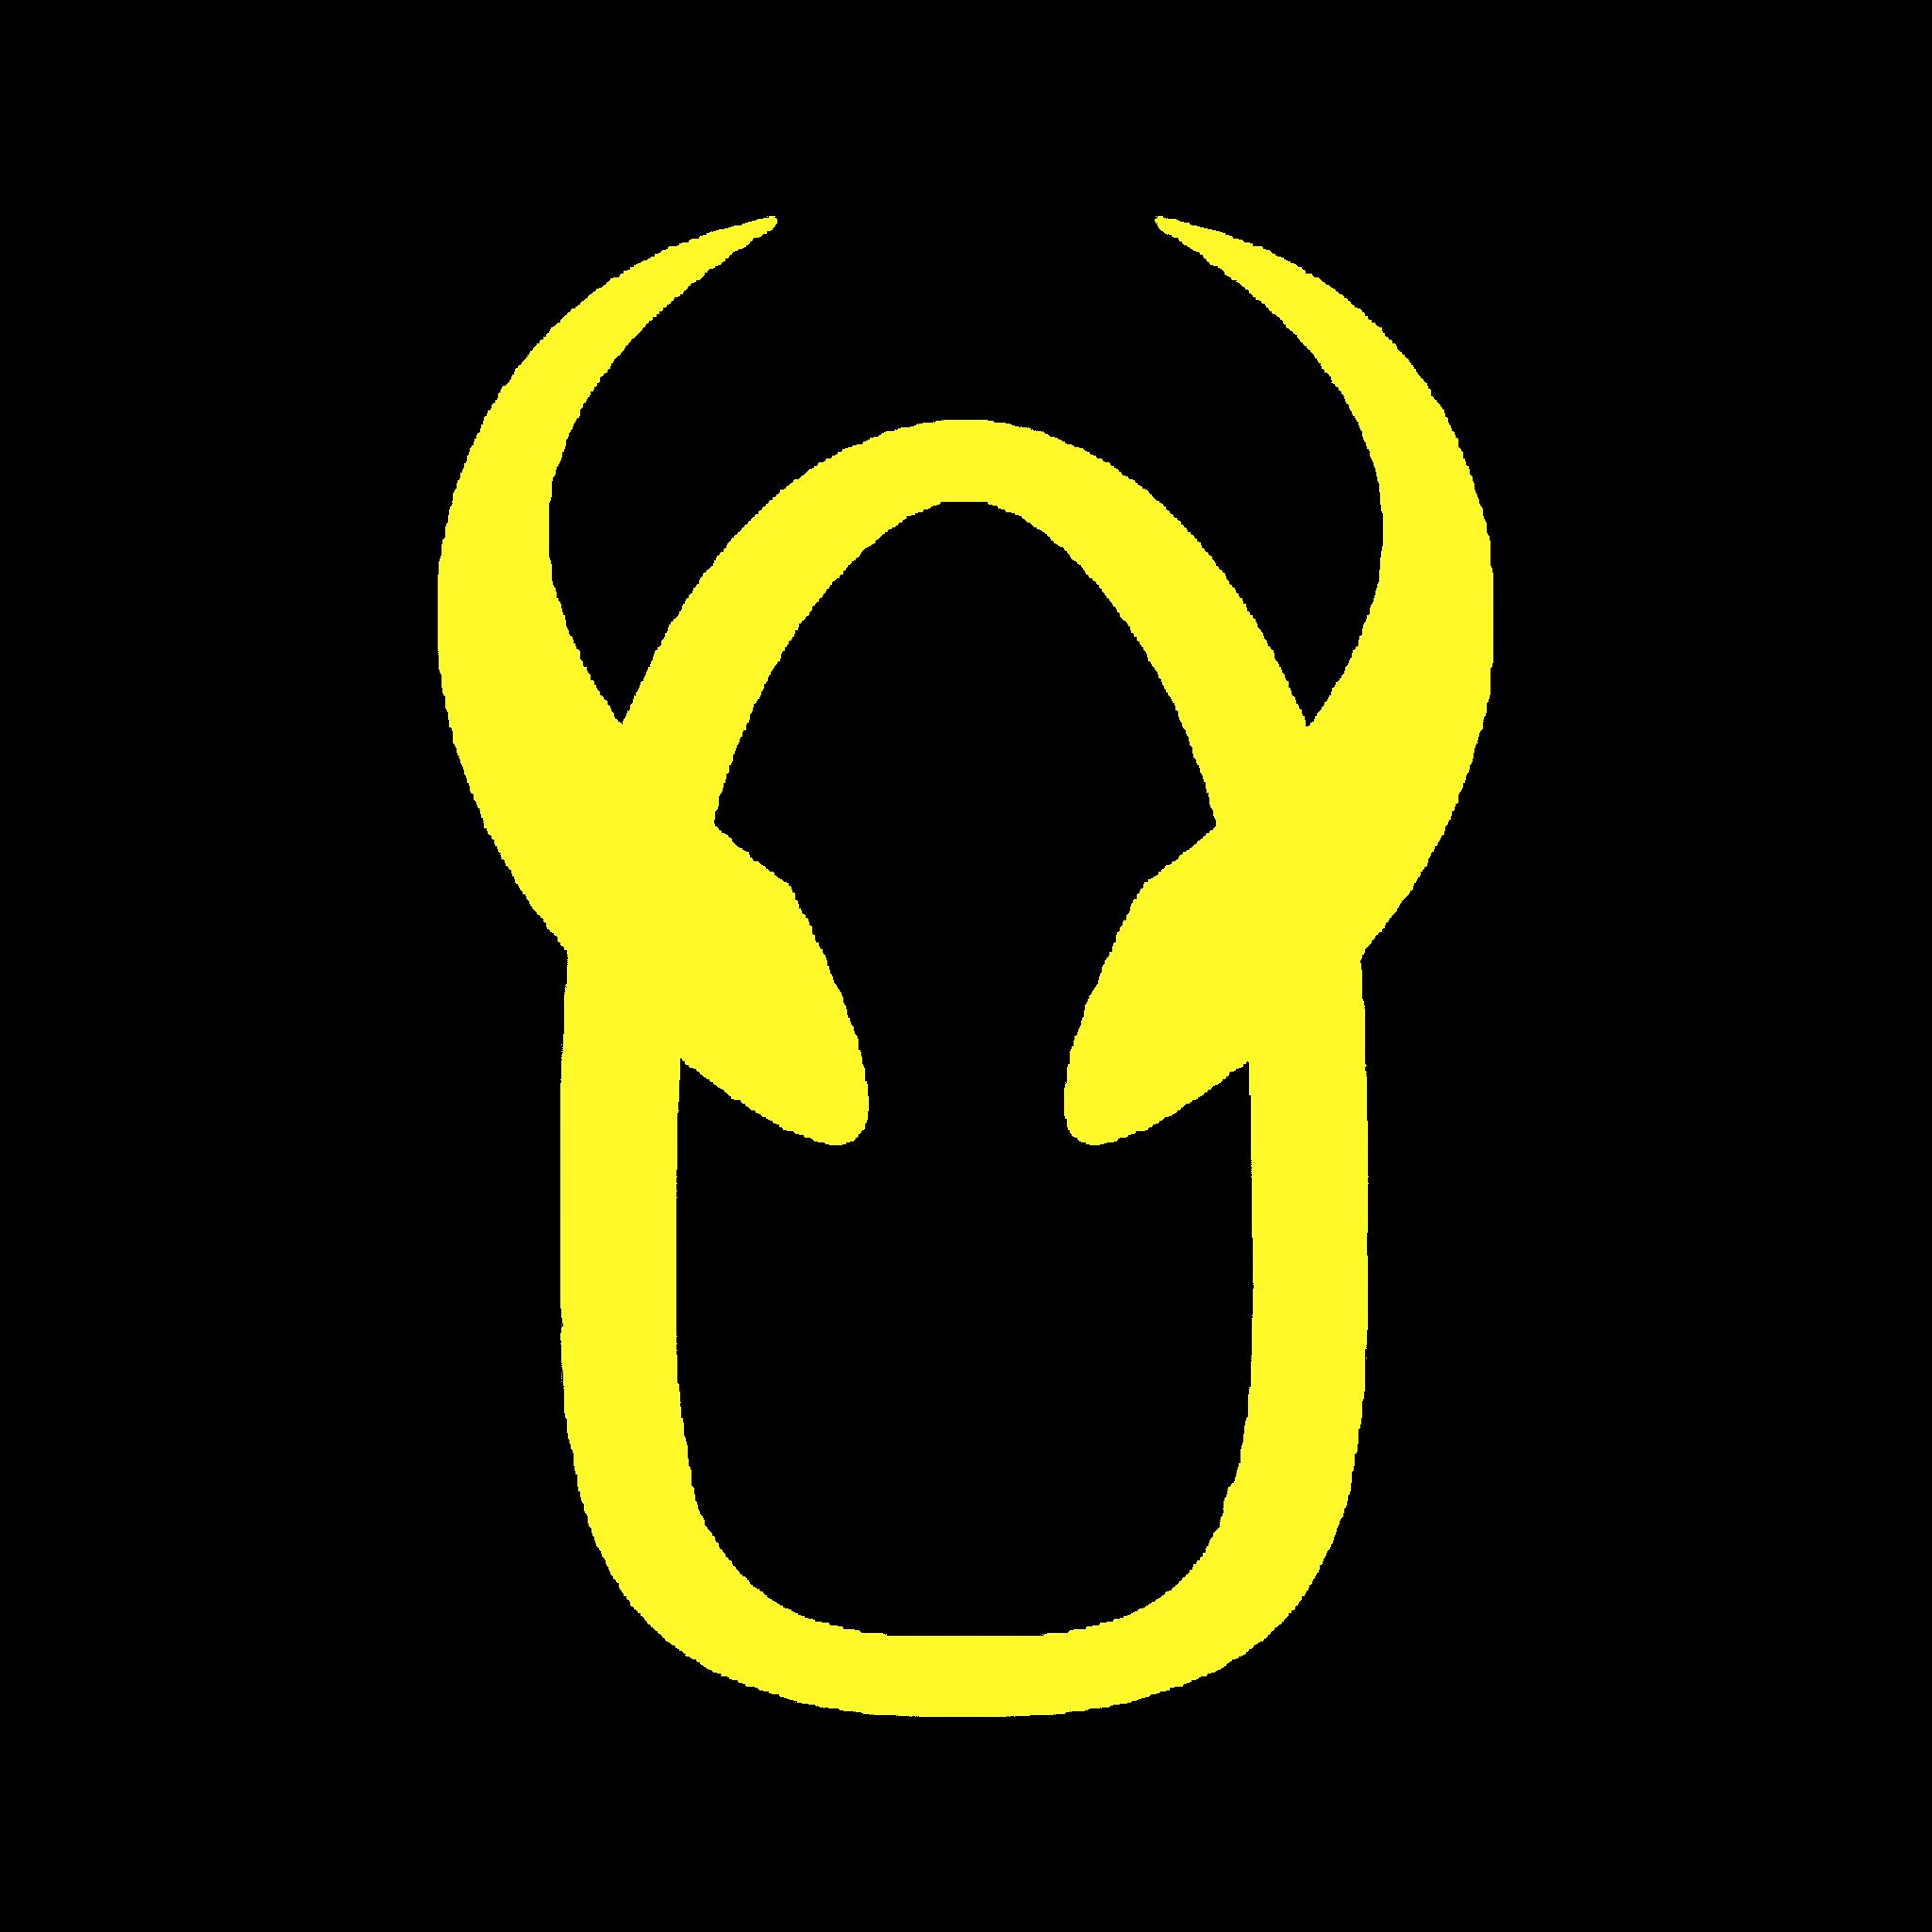 #KB Nail Emblem